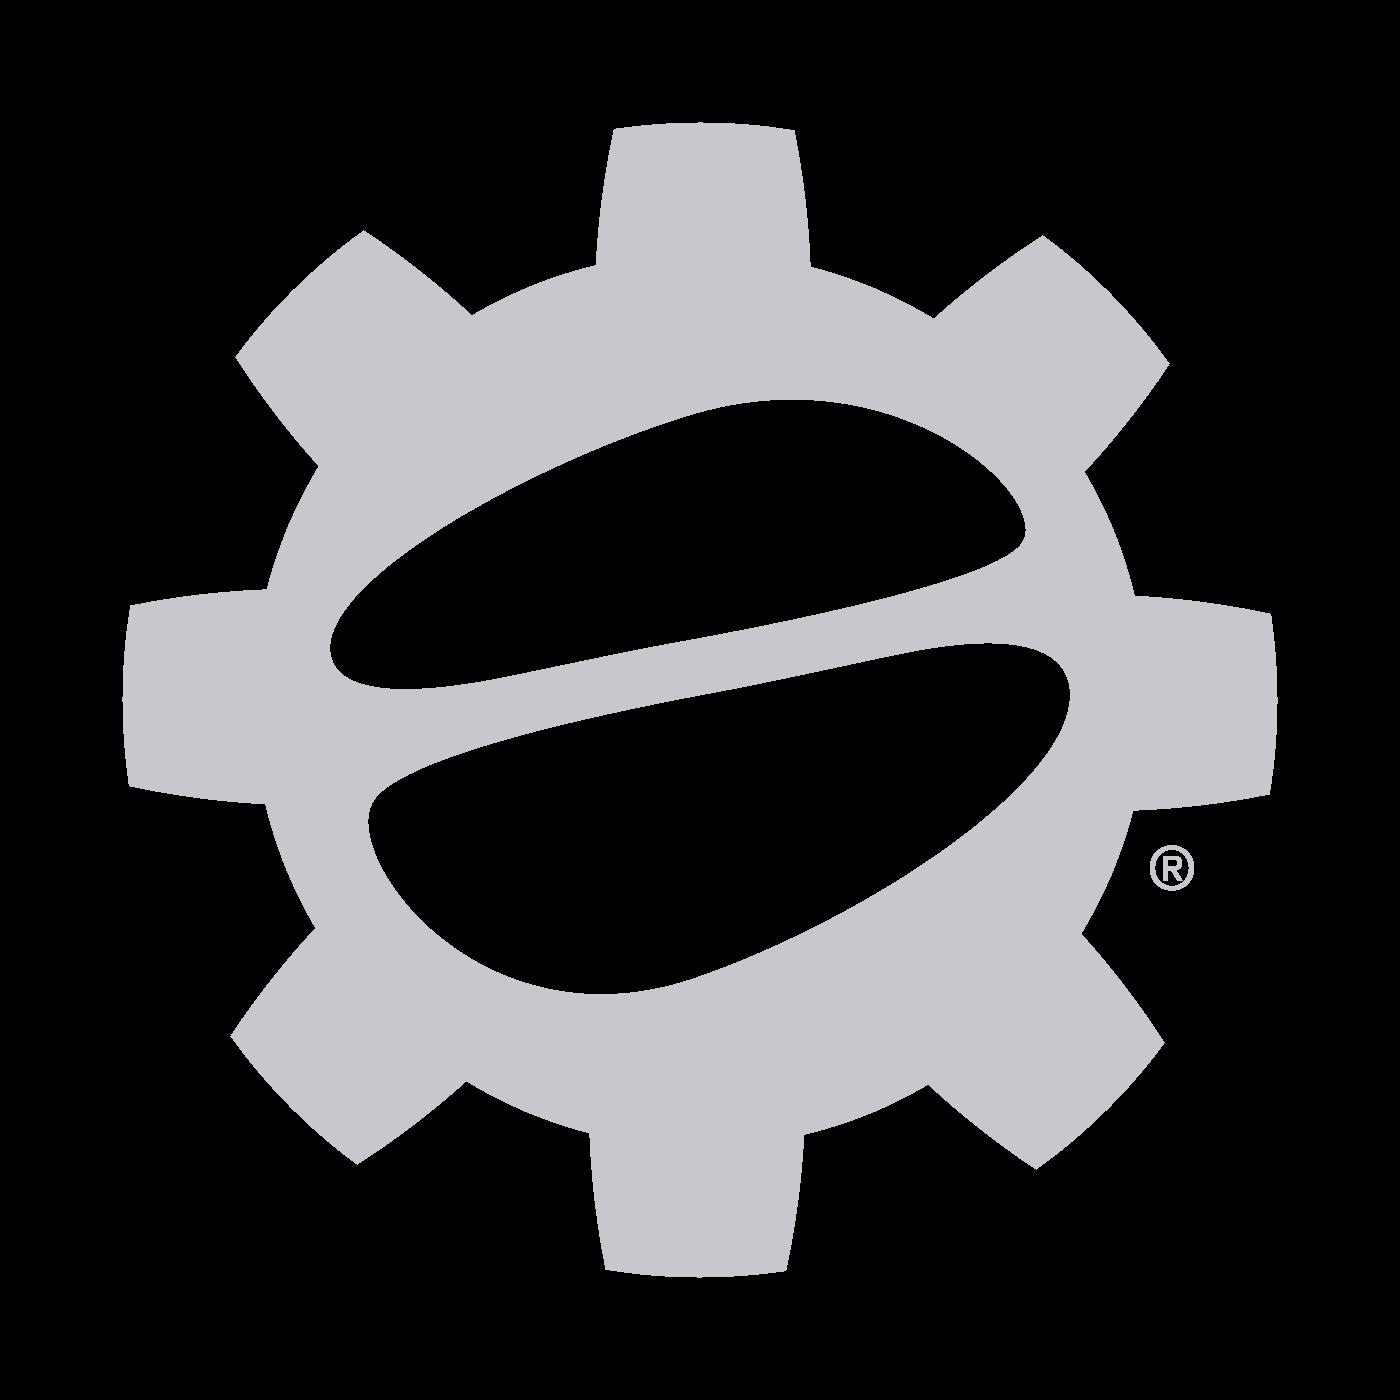 Philips Saeco 3200 LatteGo Superautomatic Espresso Machine - 3 4